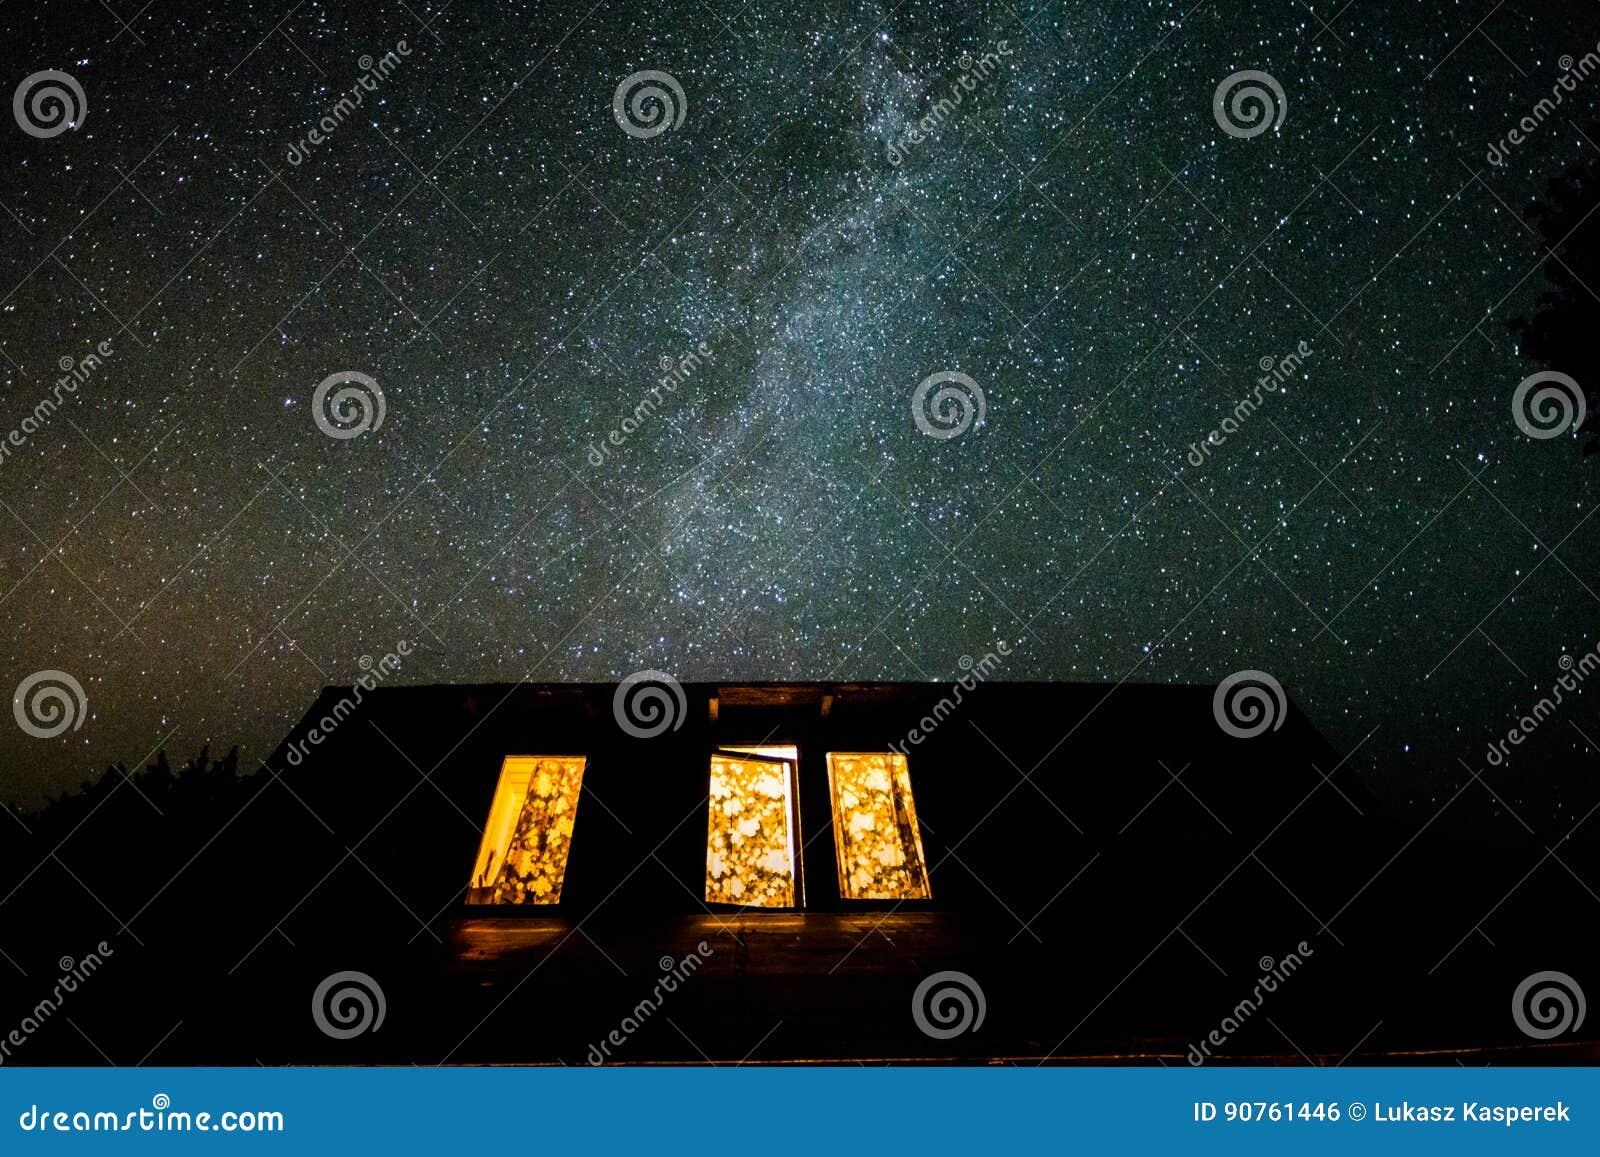 Night sky in Poland